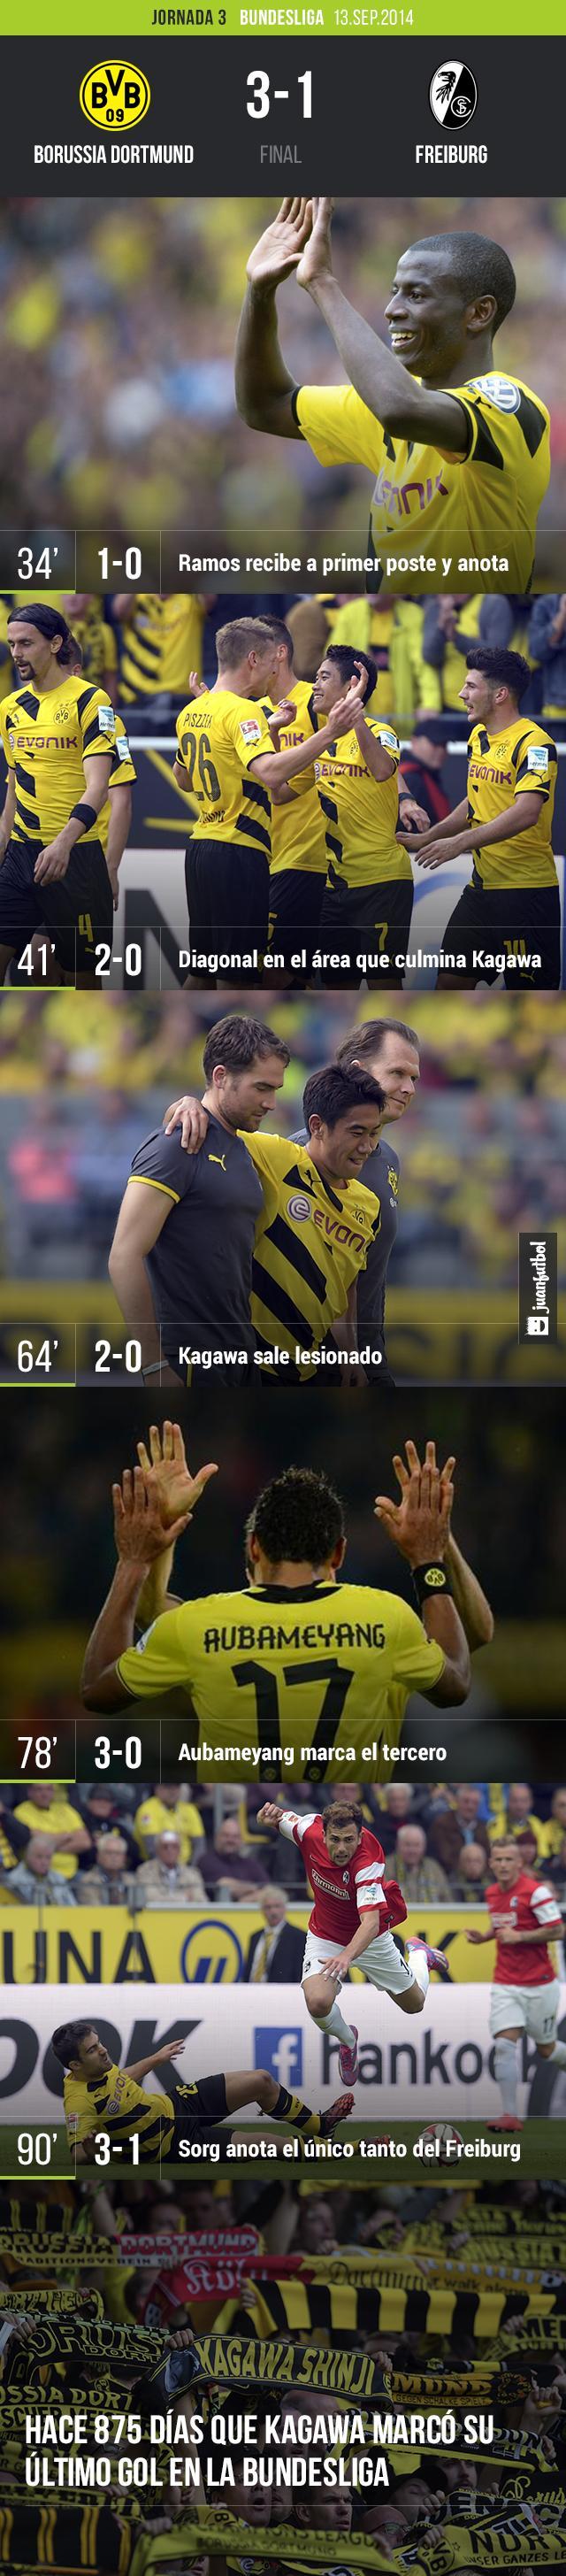 Dortmund vence al Freiburg